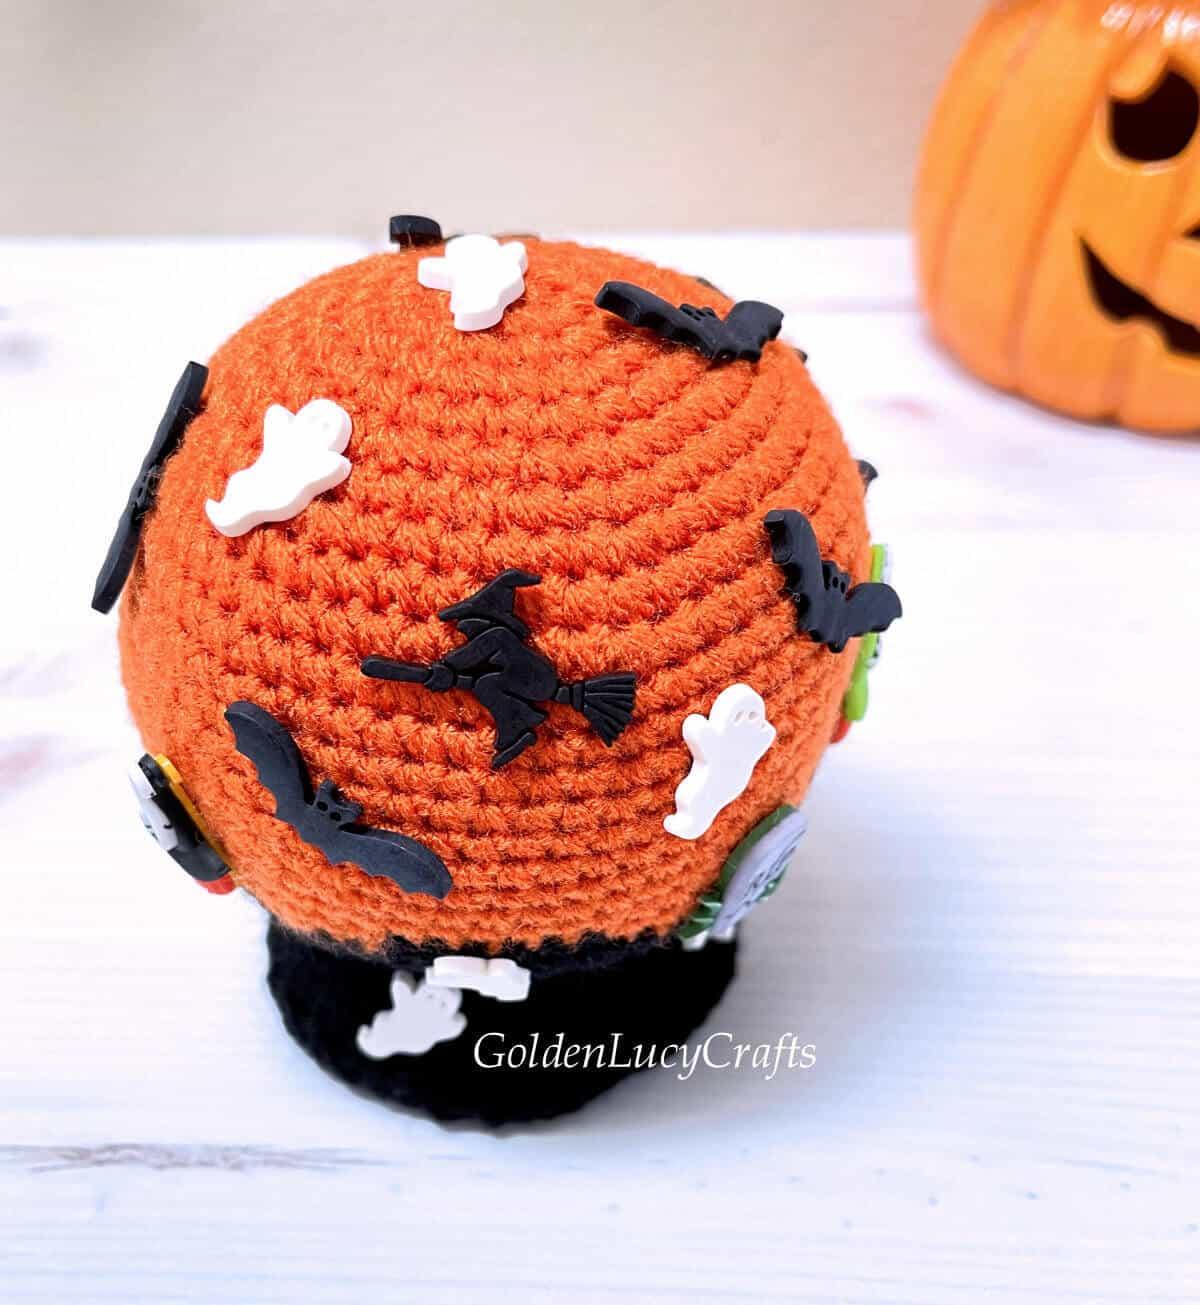 Crocheted Halloween snow globe, top view.